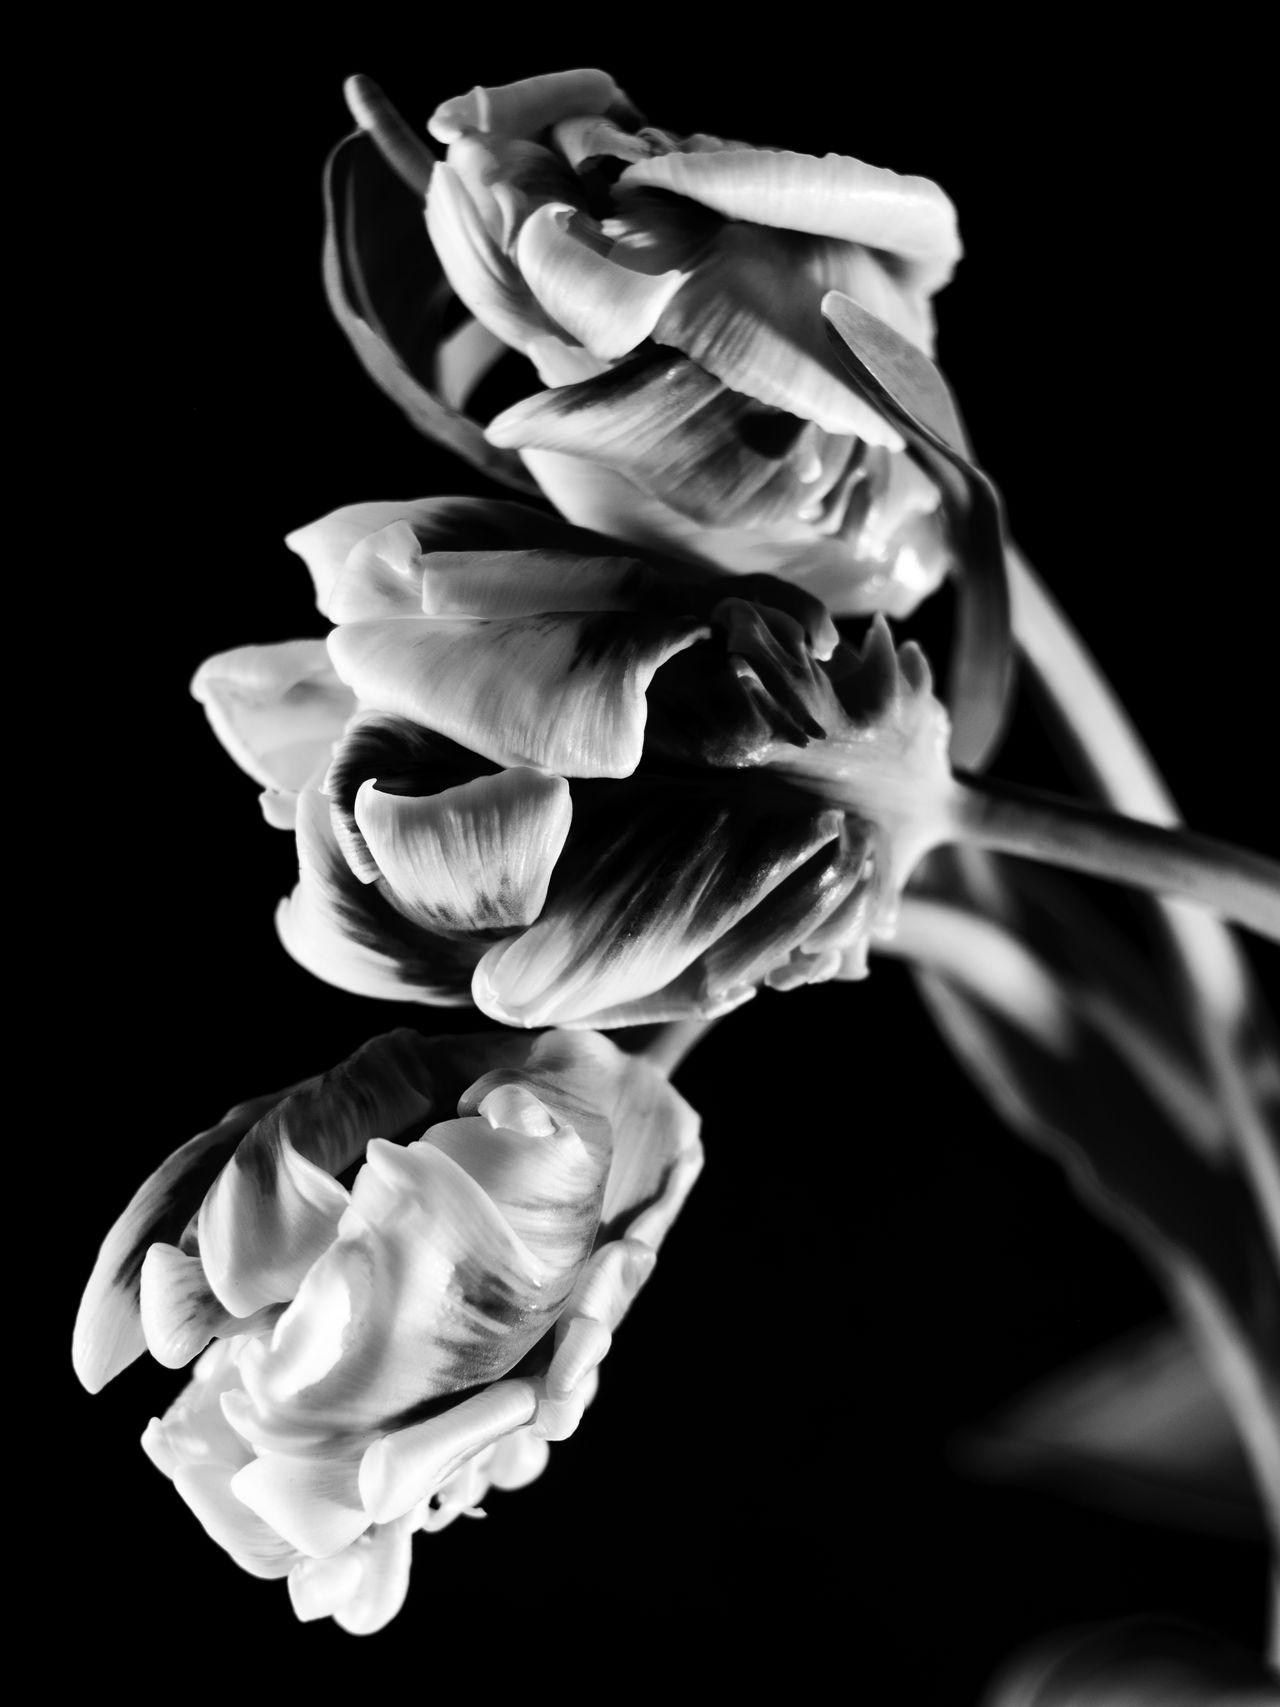 idmphotographer.com Beauty In Nature Black Background Blackandwhite Close-up Fine Art Photography Flower Flower Head Fragility Freshness Growth Indoors  Nature No People Petal Plant Studio Photography Studio Shot